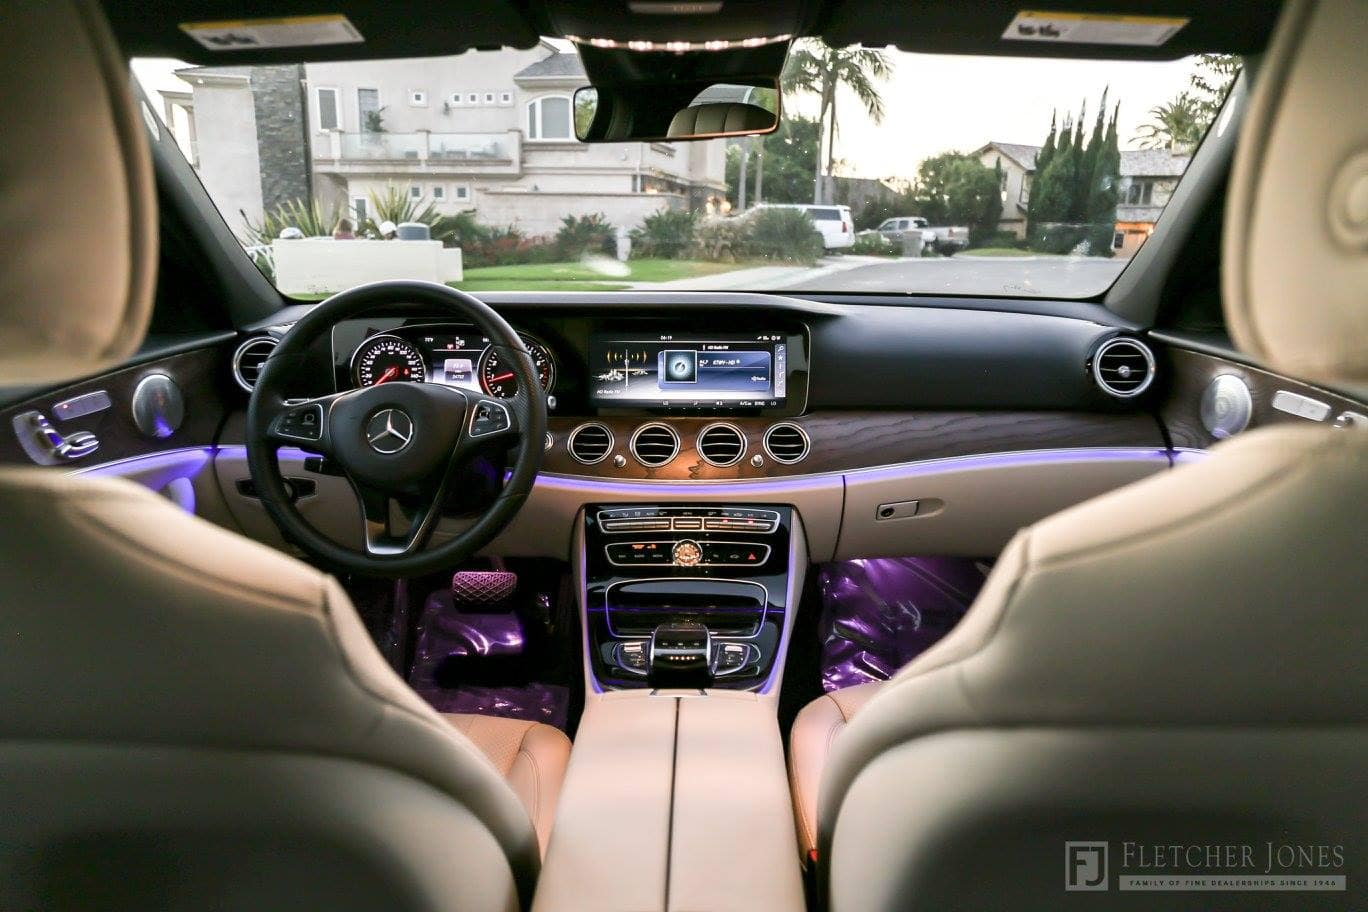 Mercedes Benz C280 Gas Tank